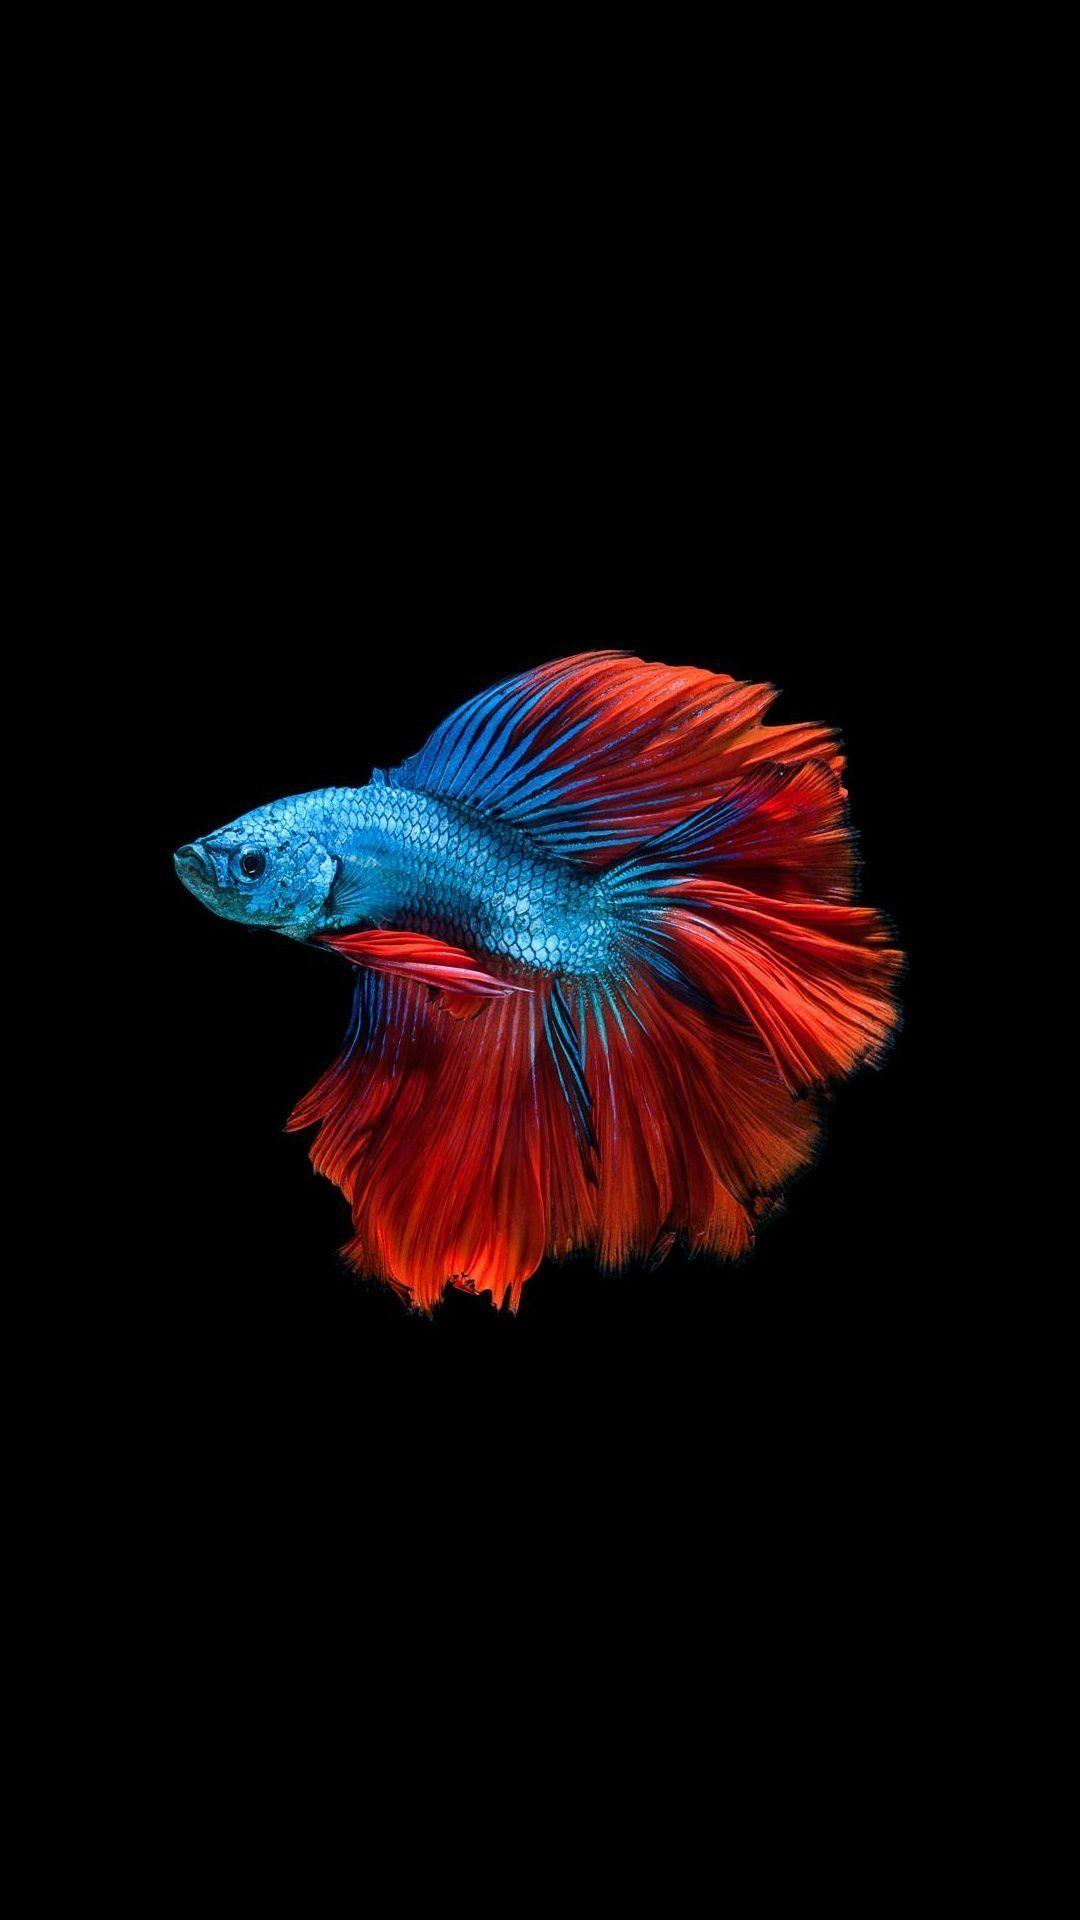 Fish Clean iPhone 5s wallpaper